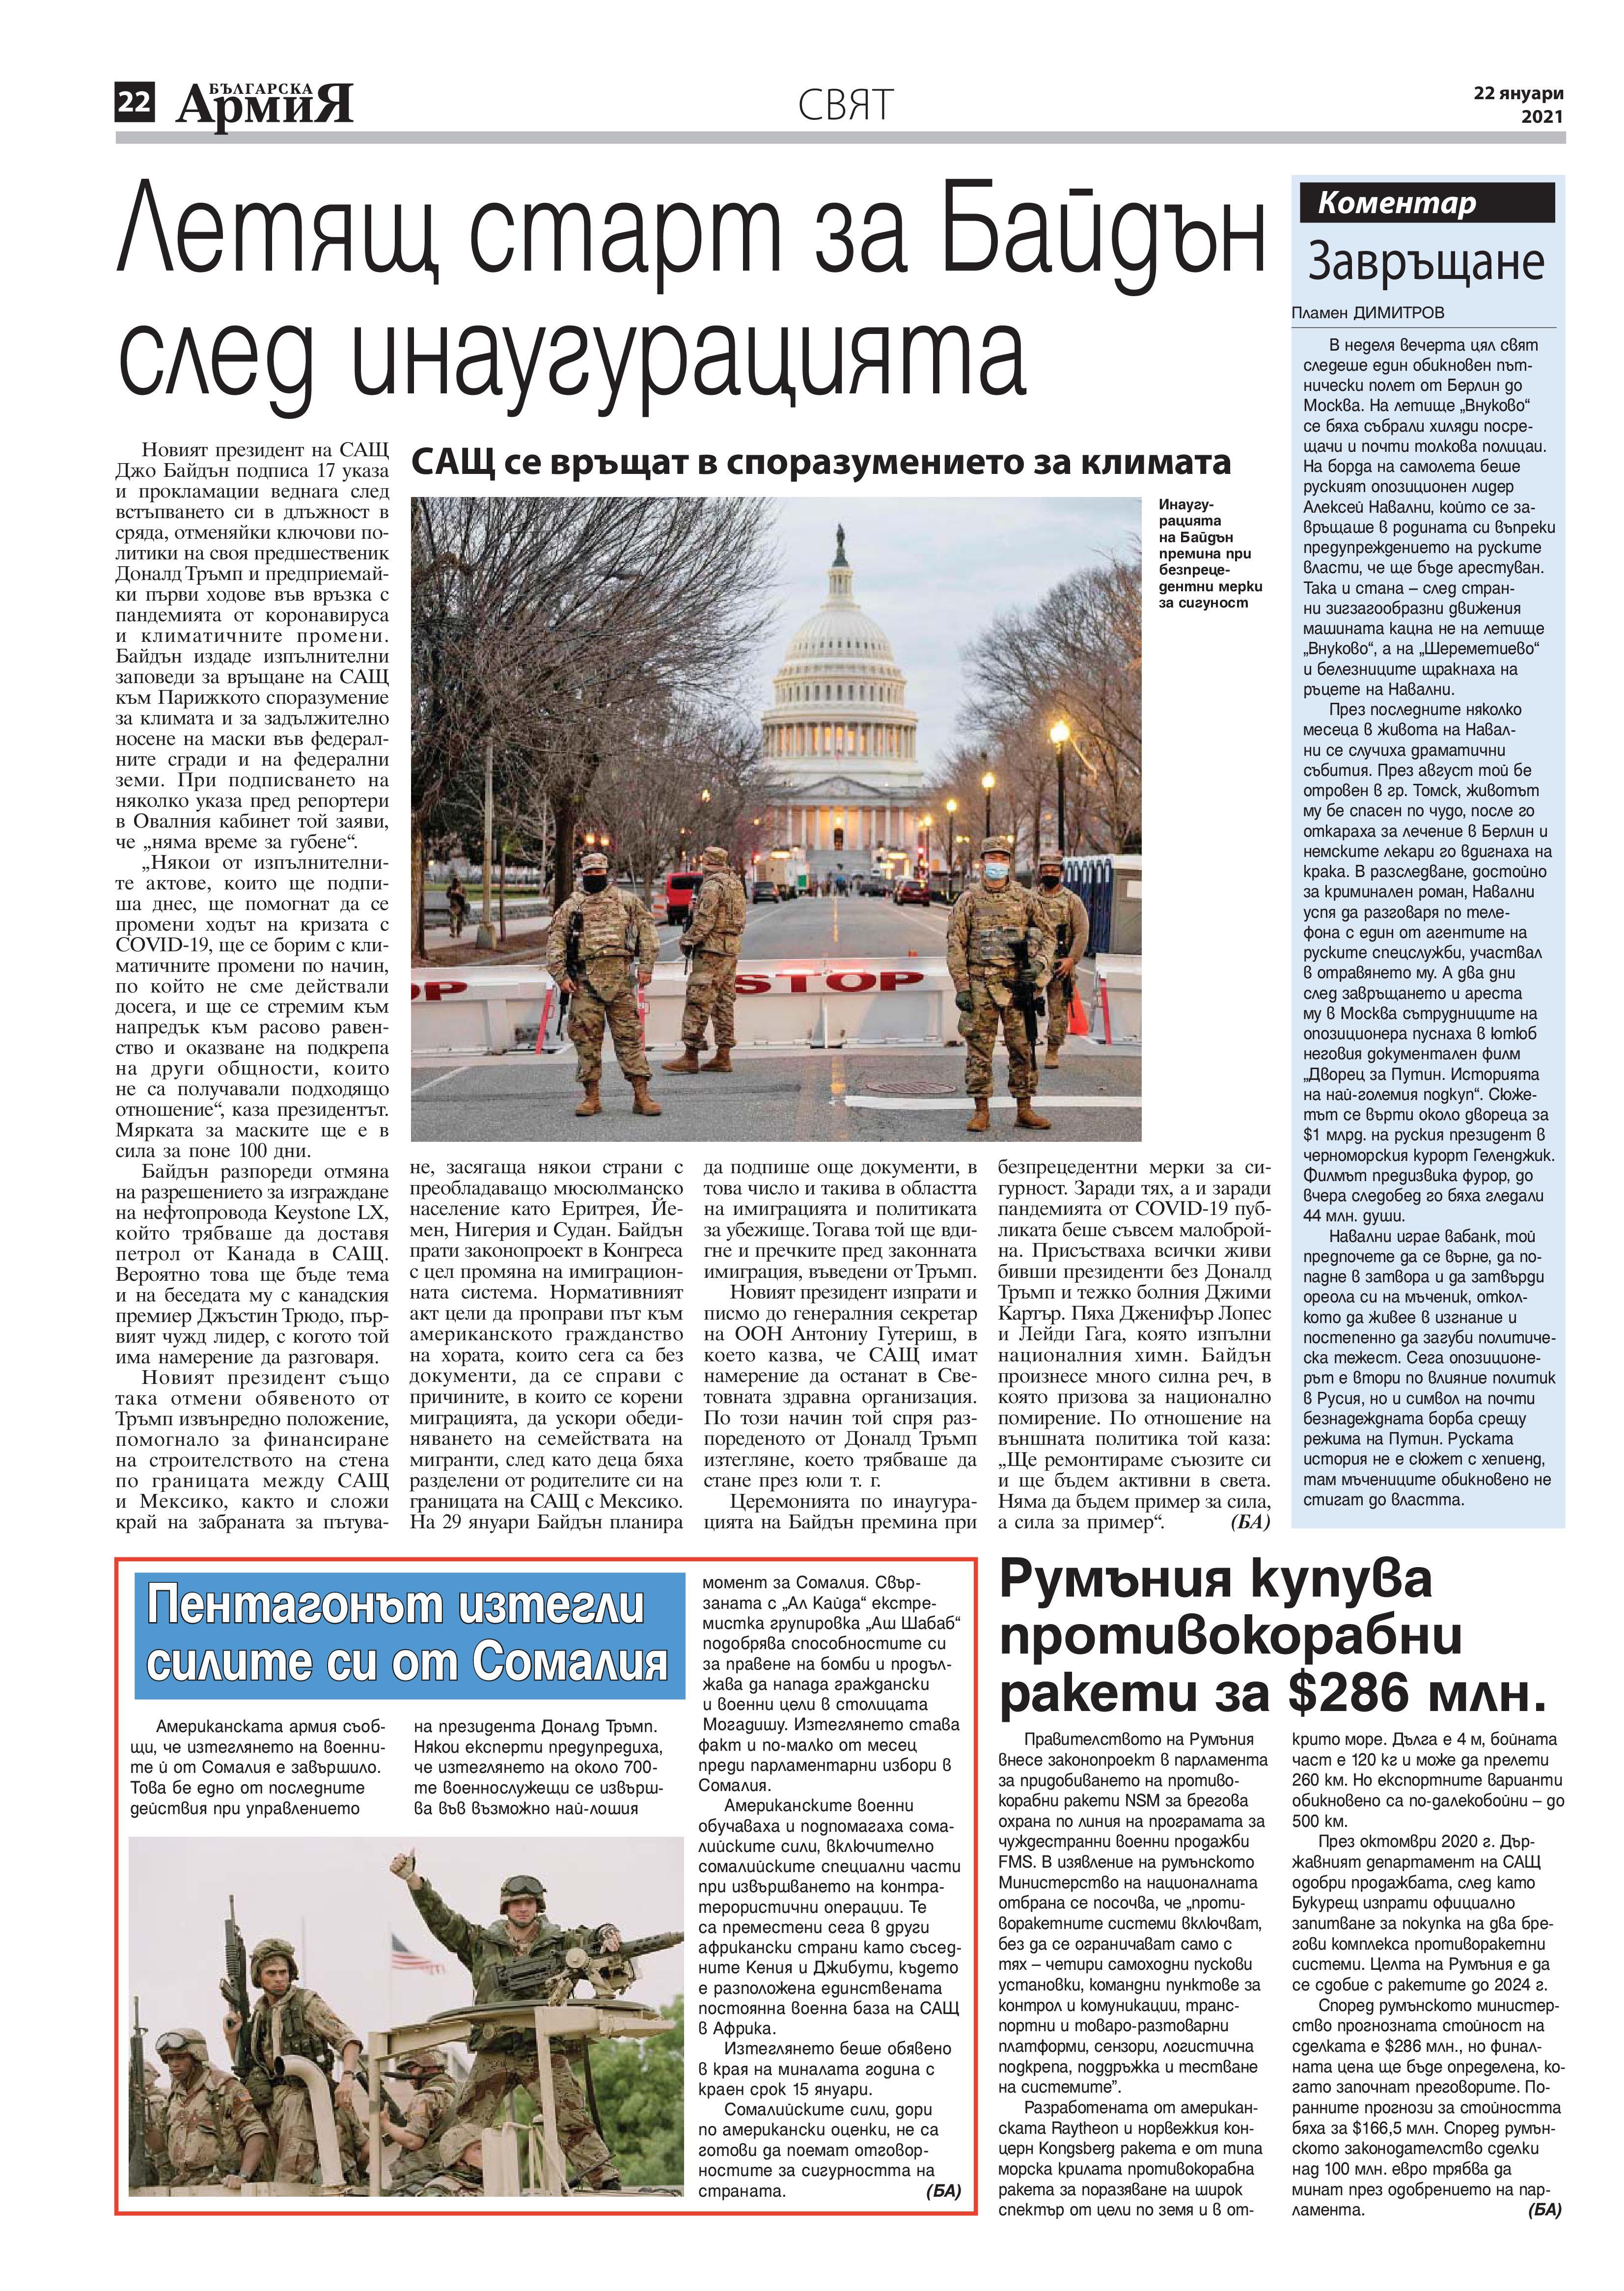 https://www.armymedia.bg/wp-content/uploads/2015/06/22-57.jpg